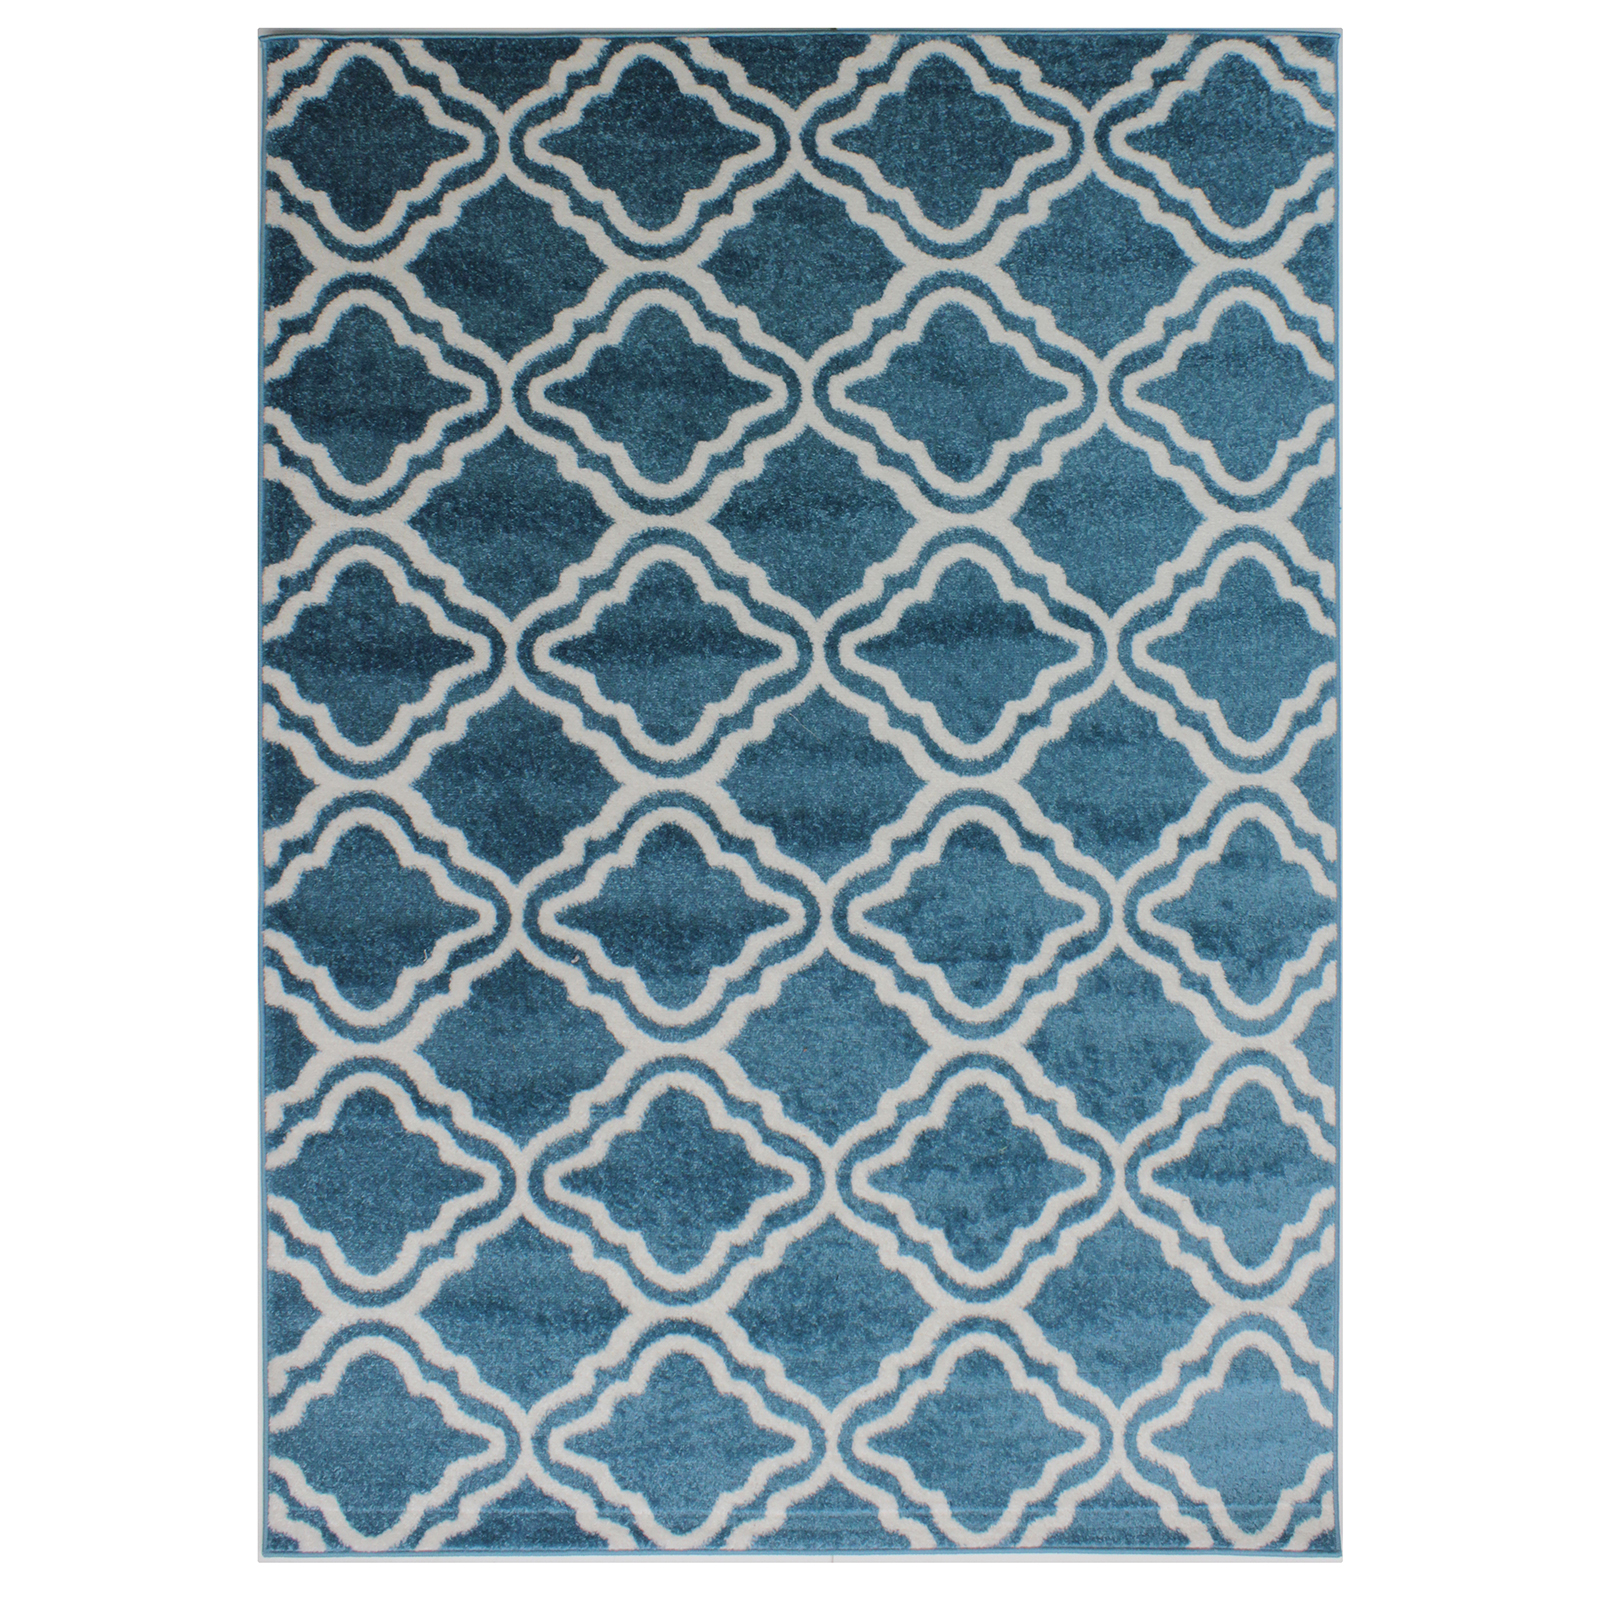 moroccanstylerugwithgeometriclatticepatternsoft. moroccan style rug with geometric lattice pattern – soft